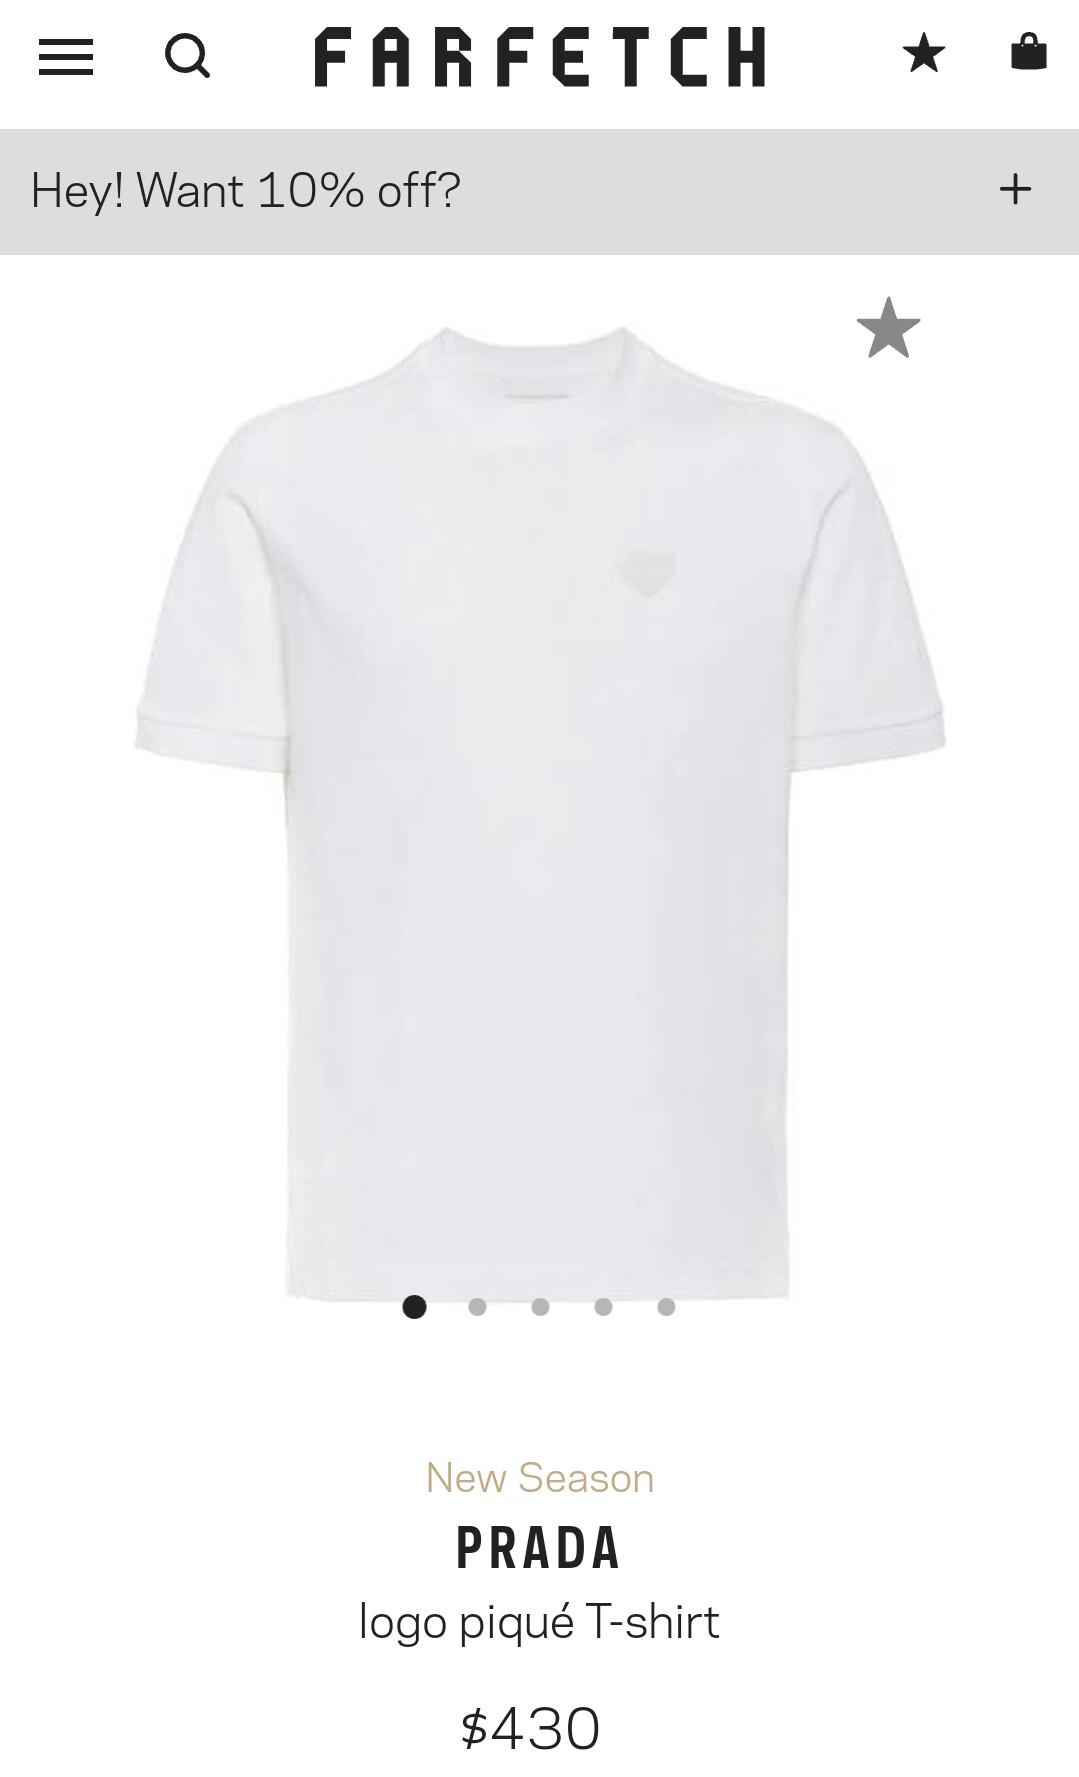 Gambar Putih Polos : gambar, putih, polos, Gila!, Prada, Putih, Polos, Seharga, Jatim, TIMES